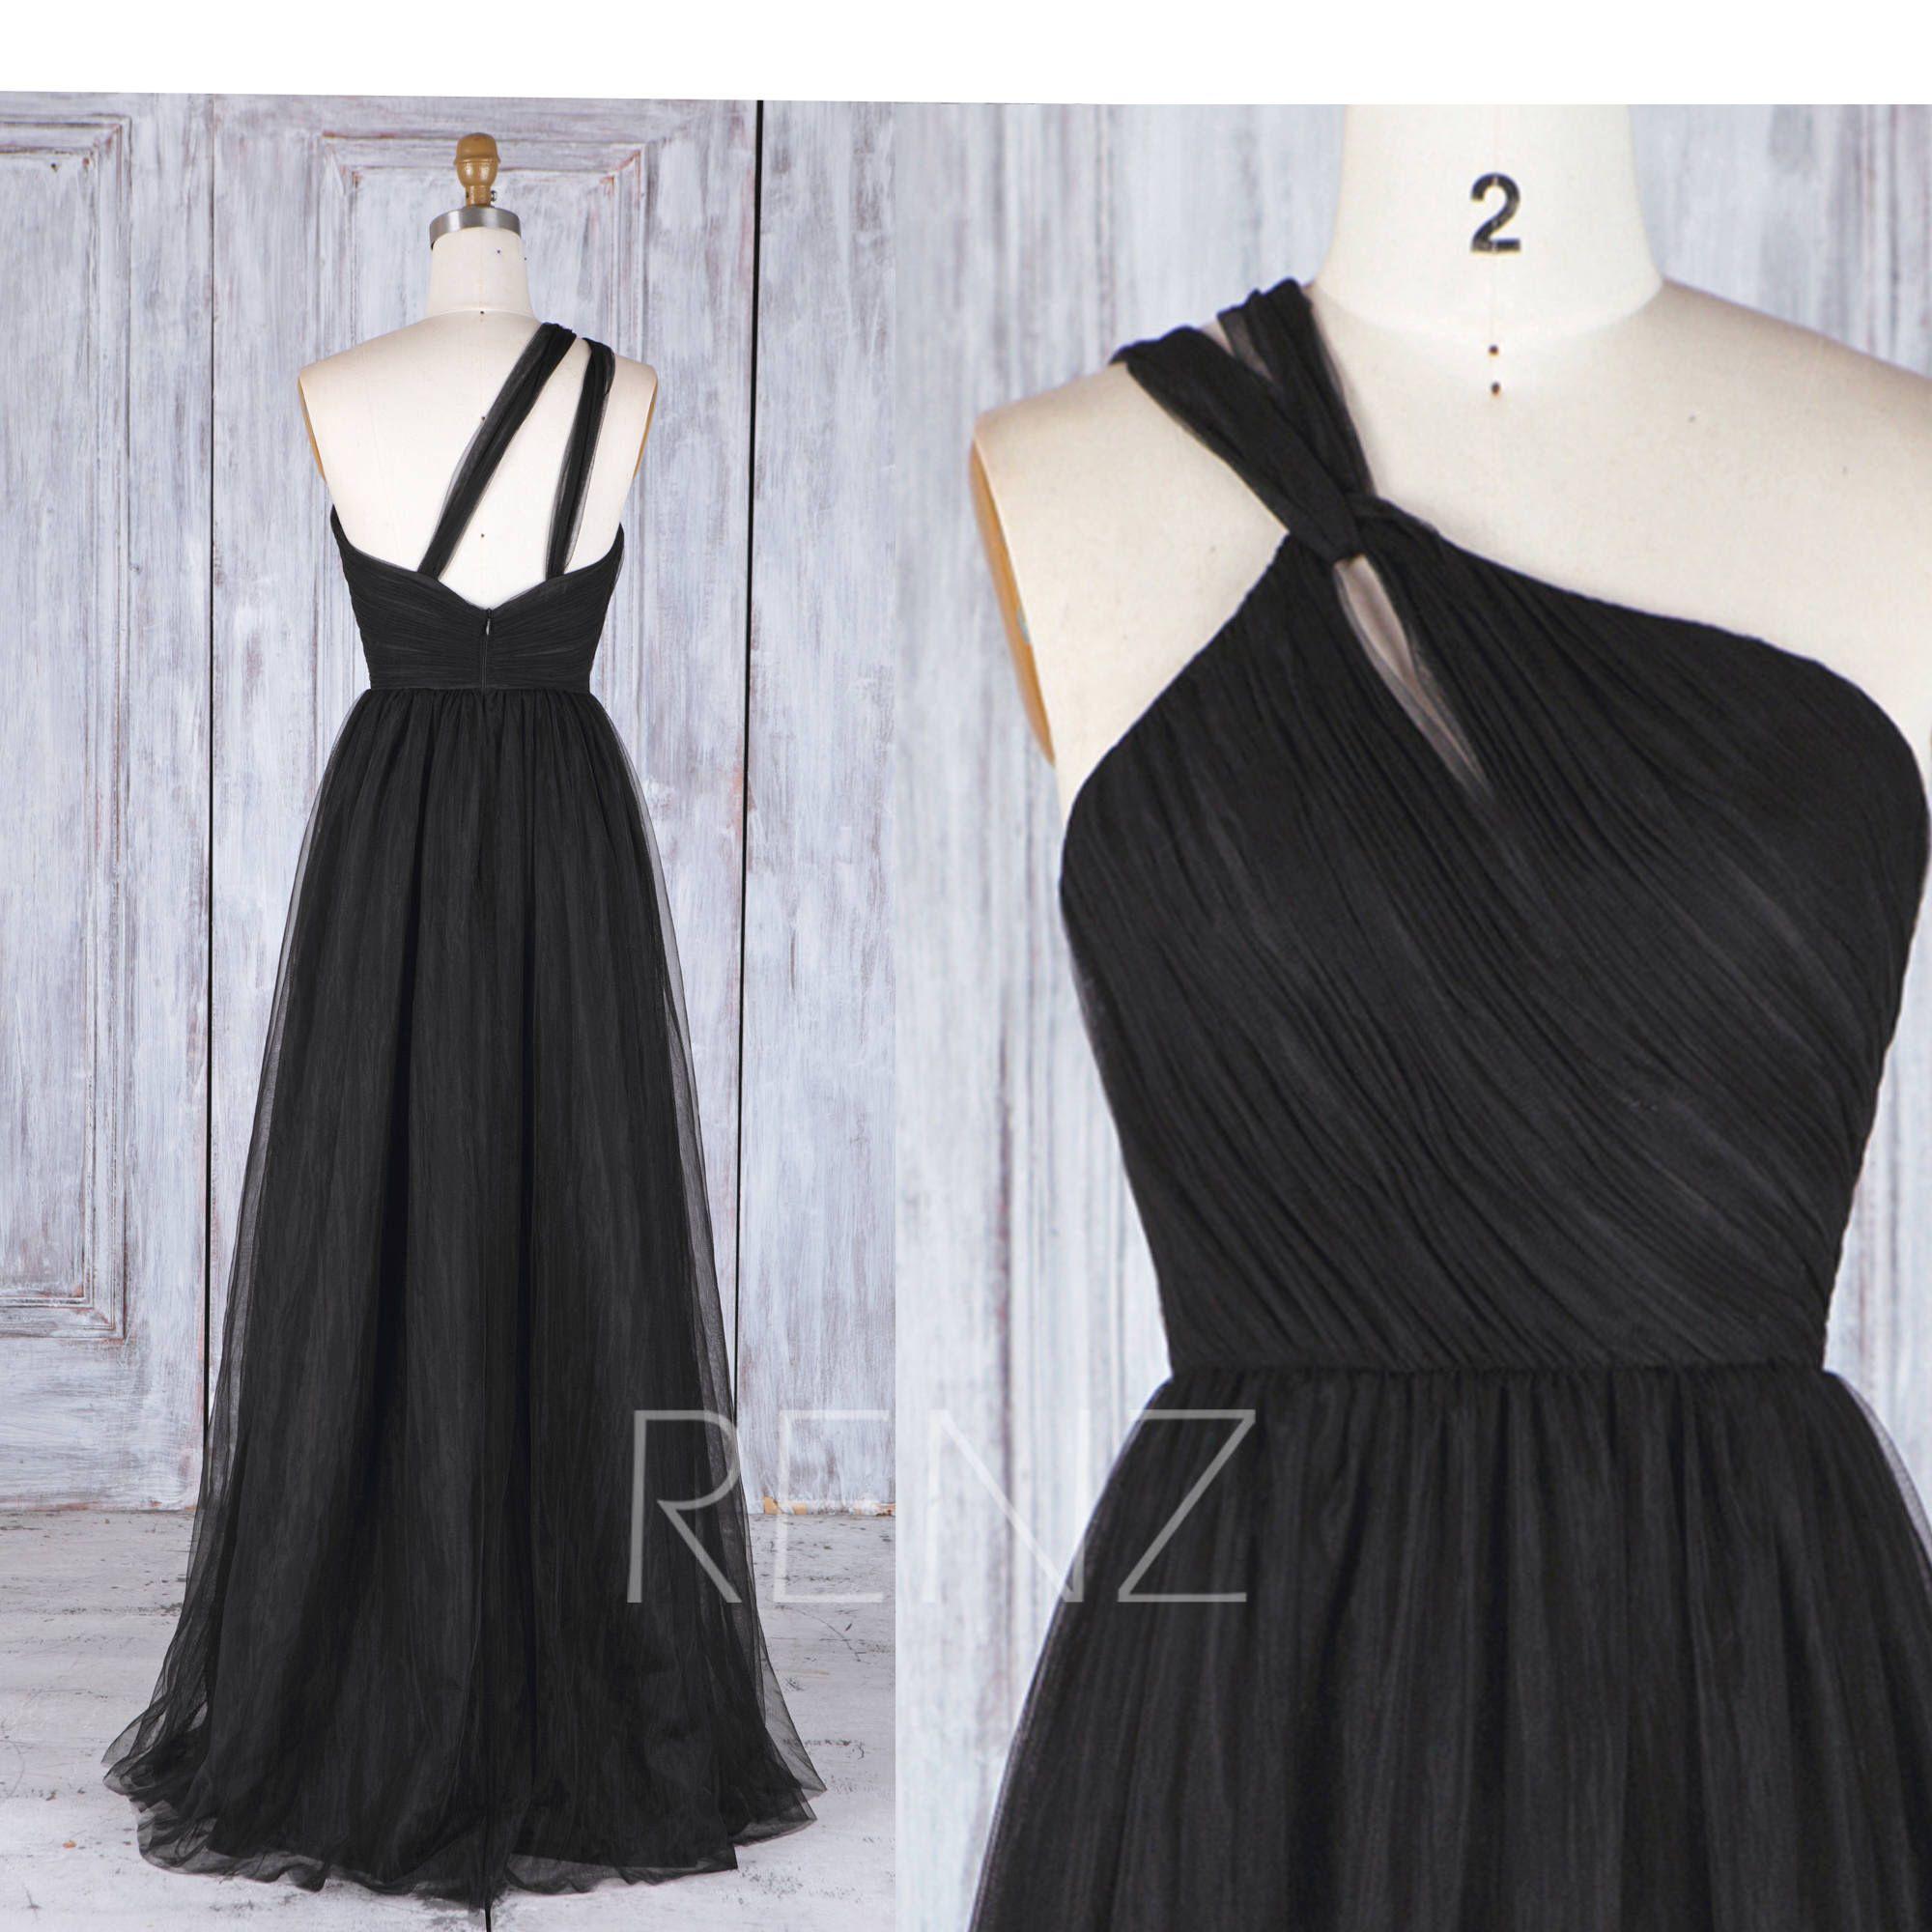 2017 black tulle bridesmaid dress one shoulder wedding dress a 2017 black tulle bridesmaid dress one shoulder wedding dress a line ball gown ombrellifo Choice Image